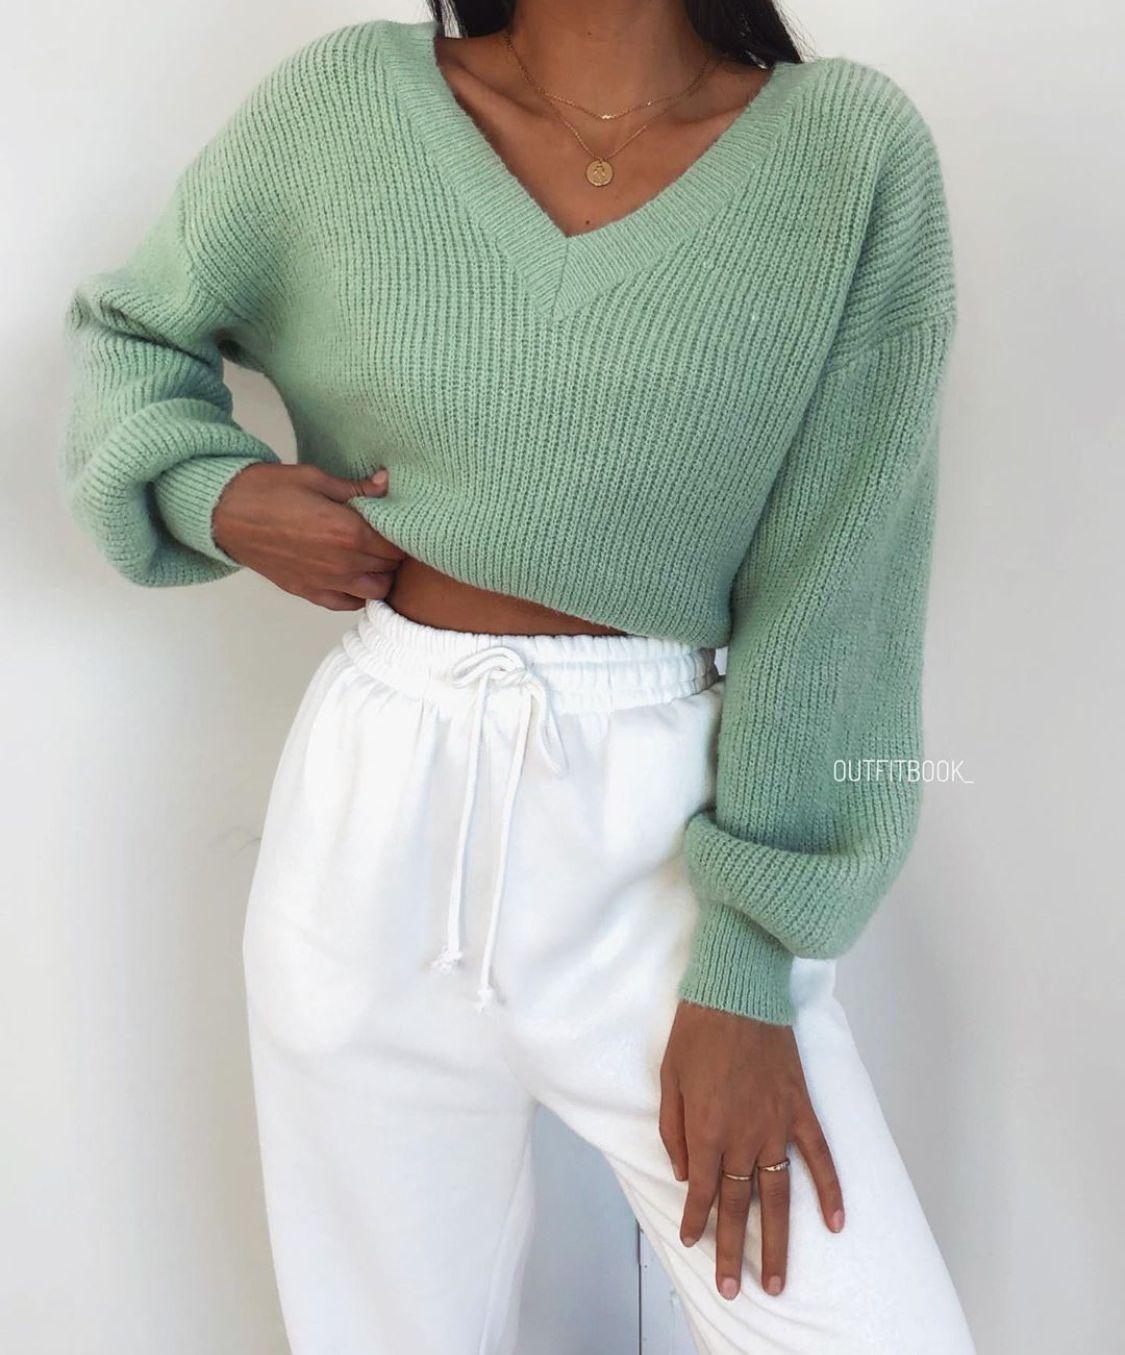 outfitbook #clothingideas